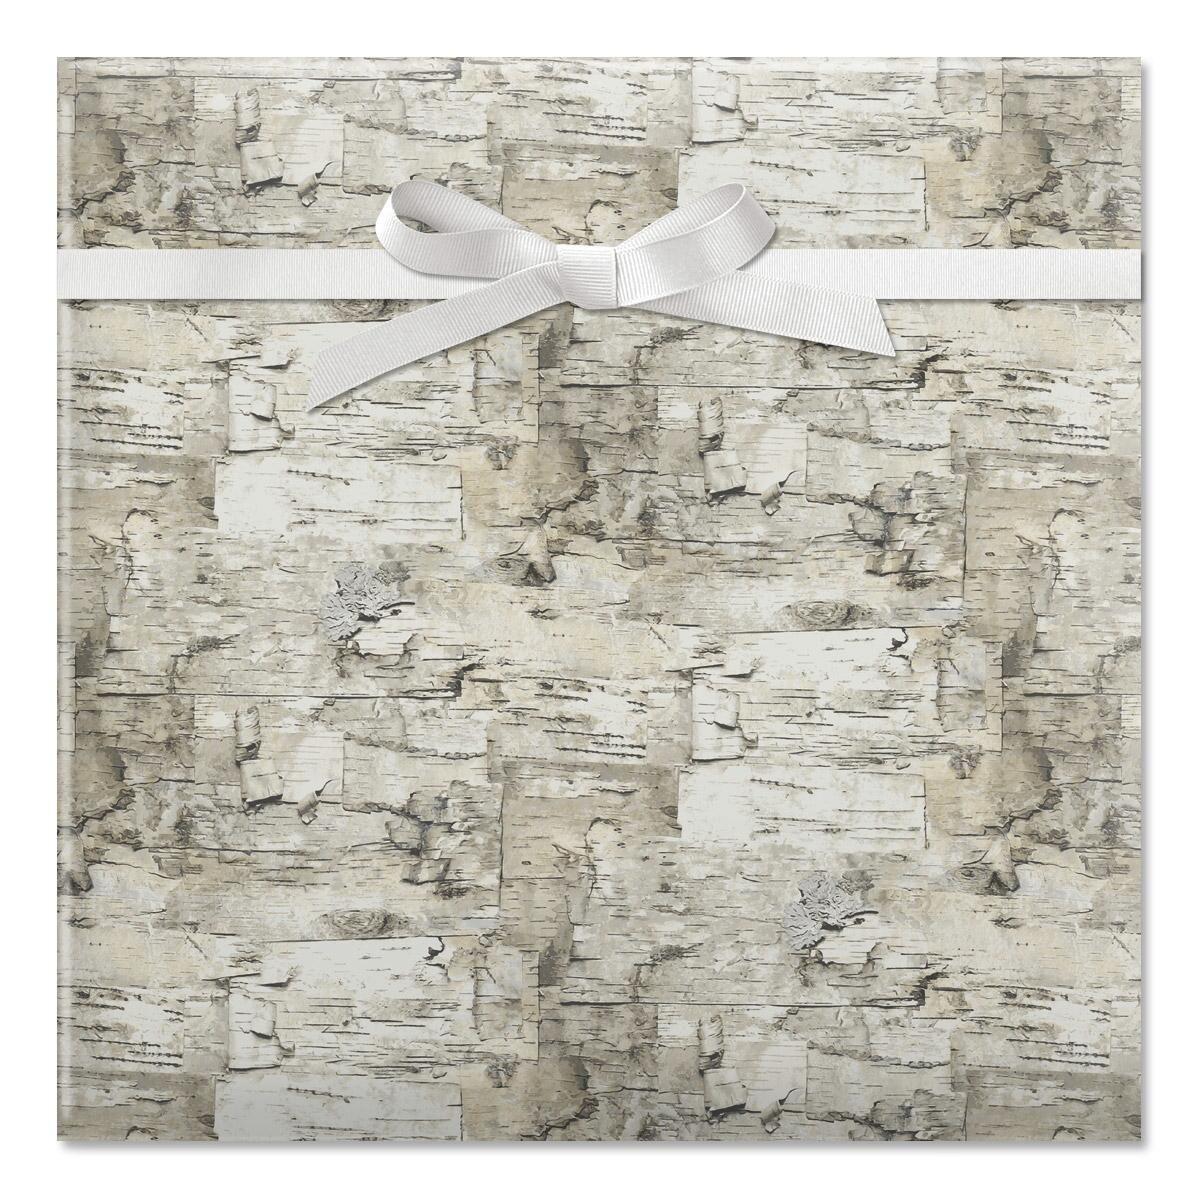 Birch Jumbo Rolled Gift Wrap